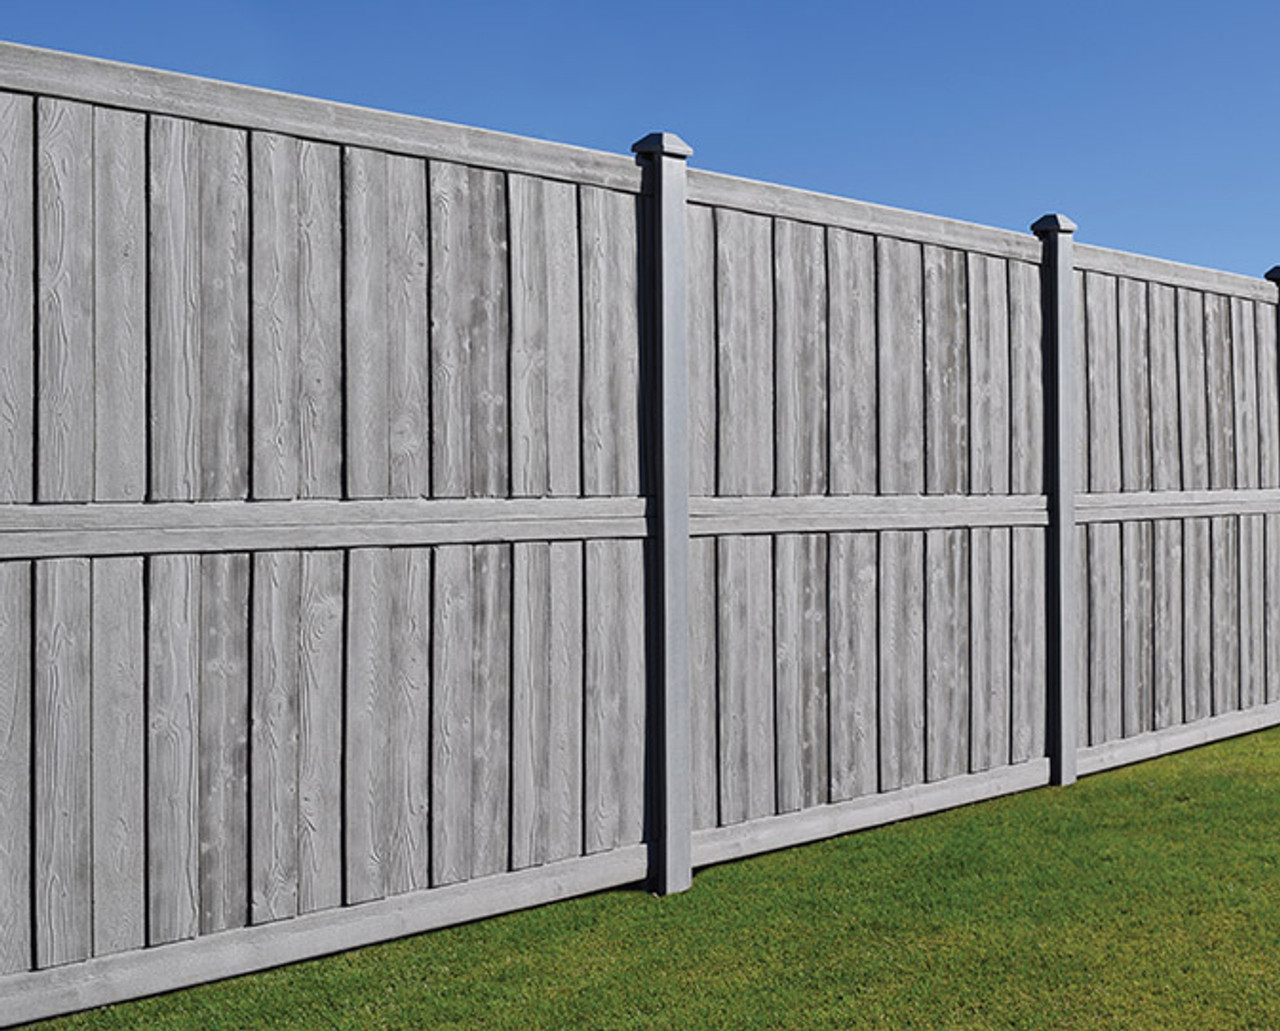 Bufftech Sherwood Molded Vinyl Fence Panels, Realistic Wood Look & Feel    Multiple Sizes & Colors